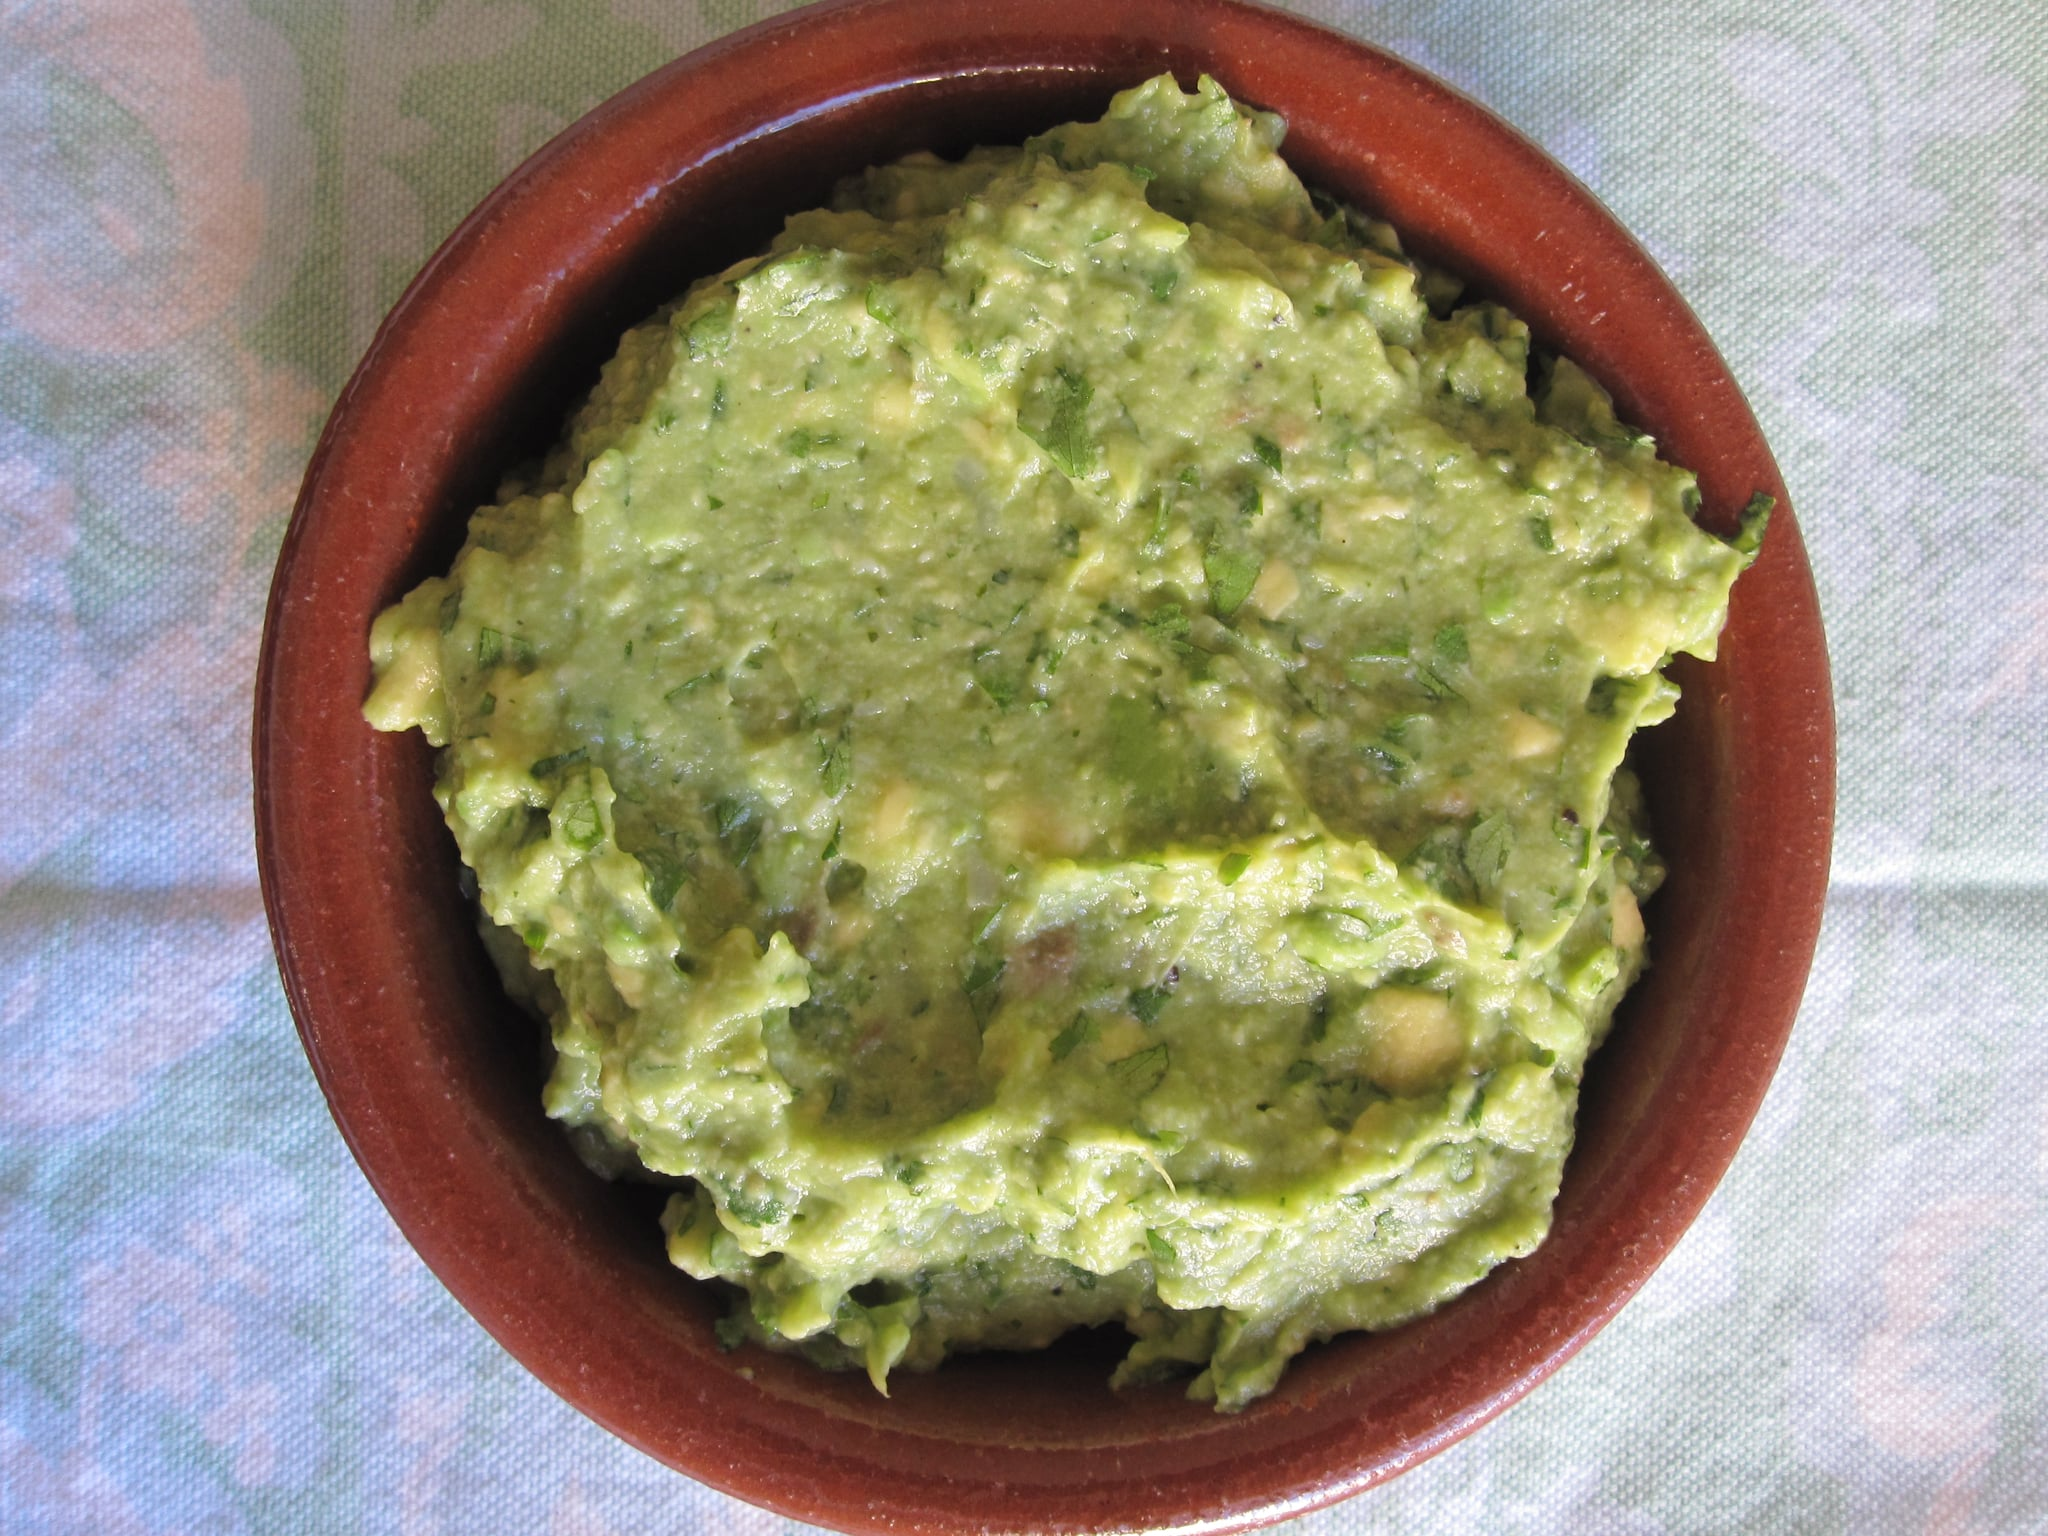 Roasted Garlic Guacamole   Mouthwatering Guacamole Recipes That'll ...